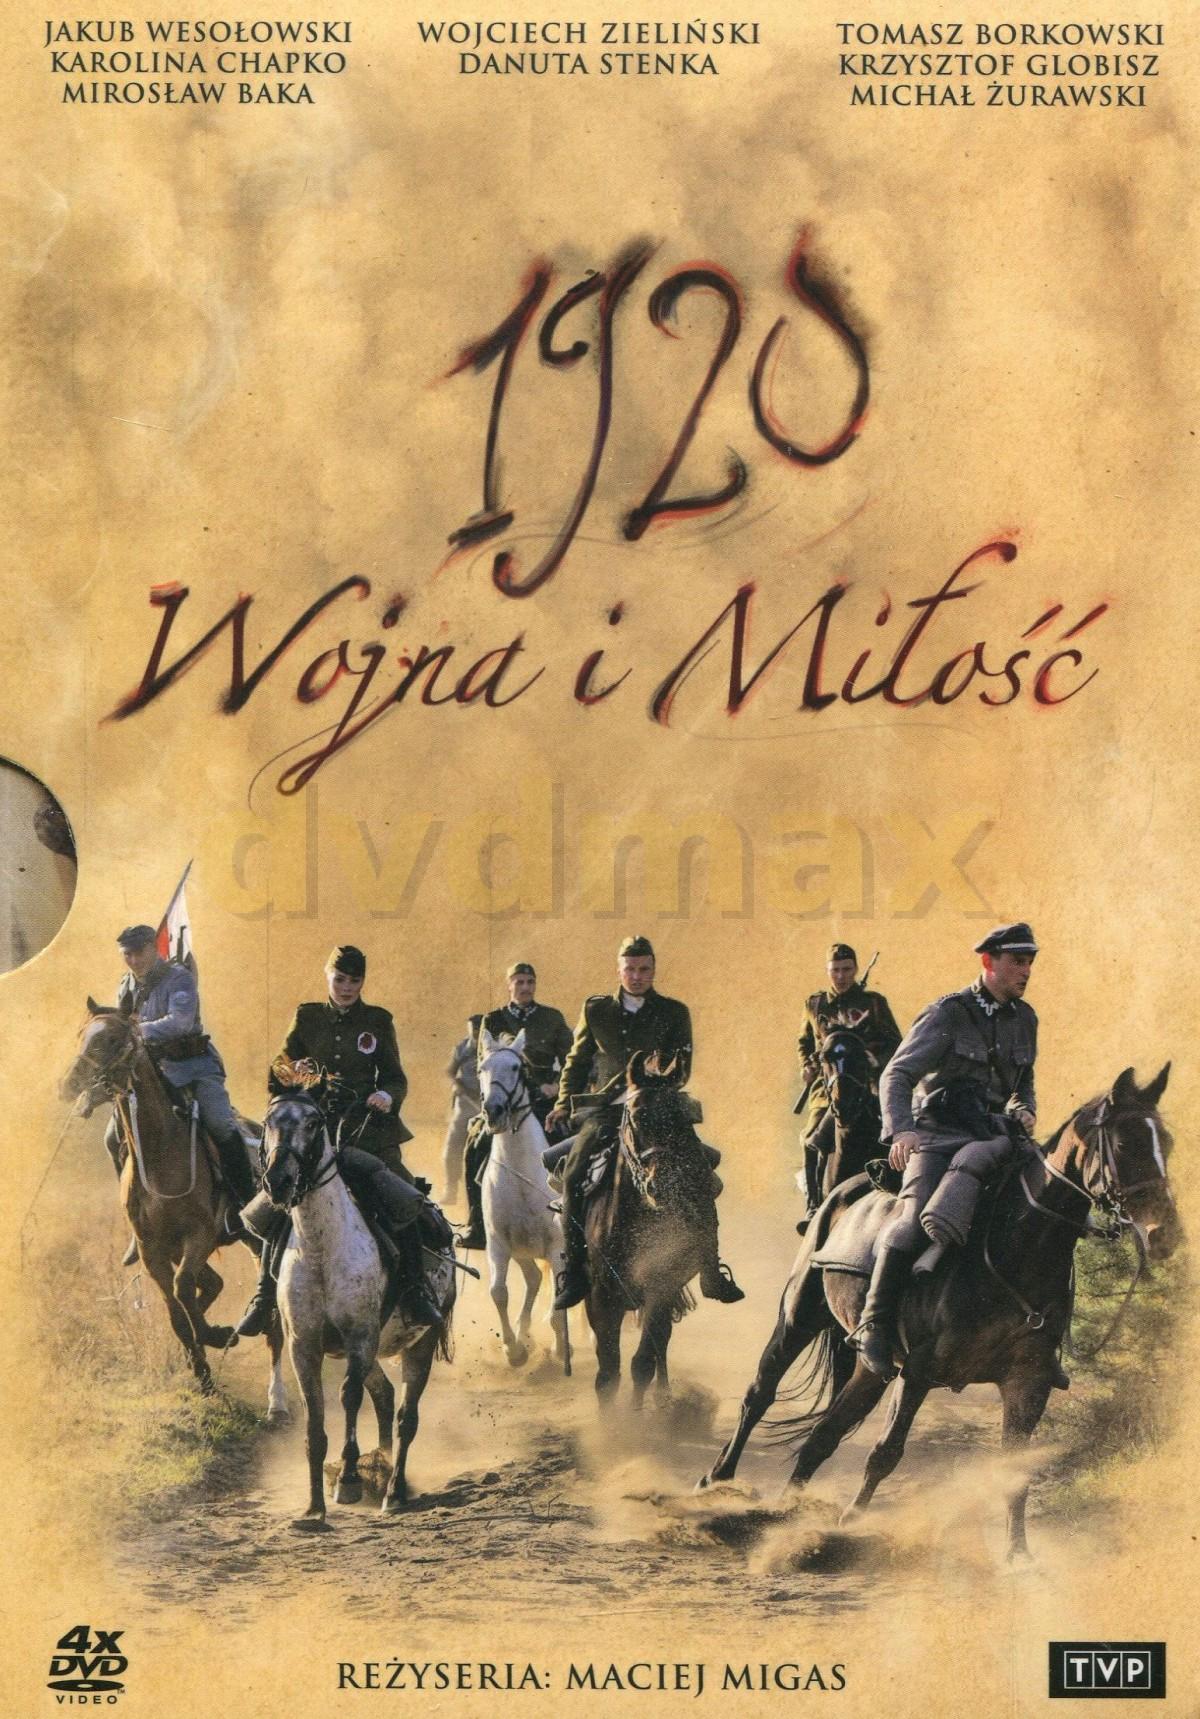 1920. Wojna i miłość (serial TV)